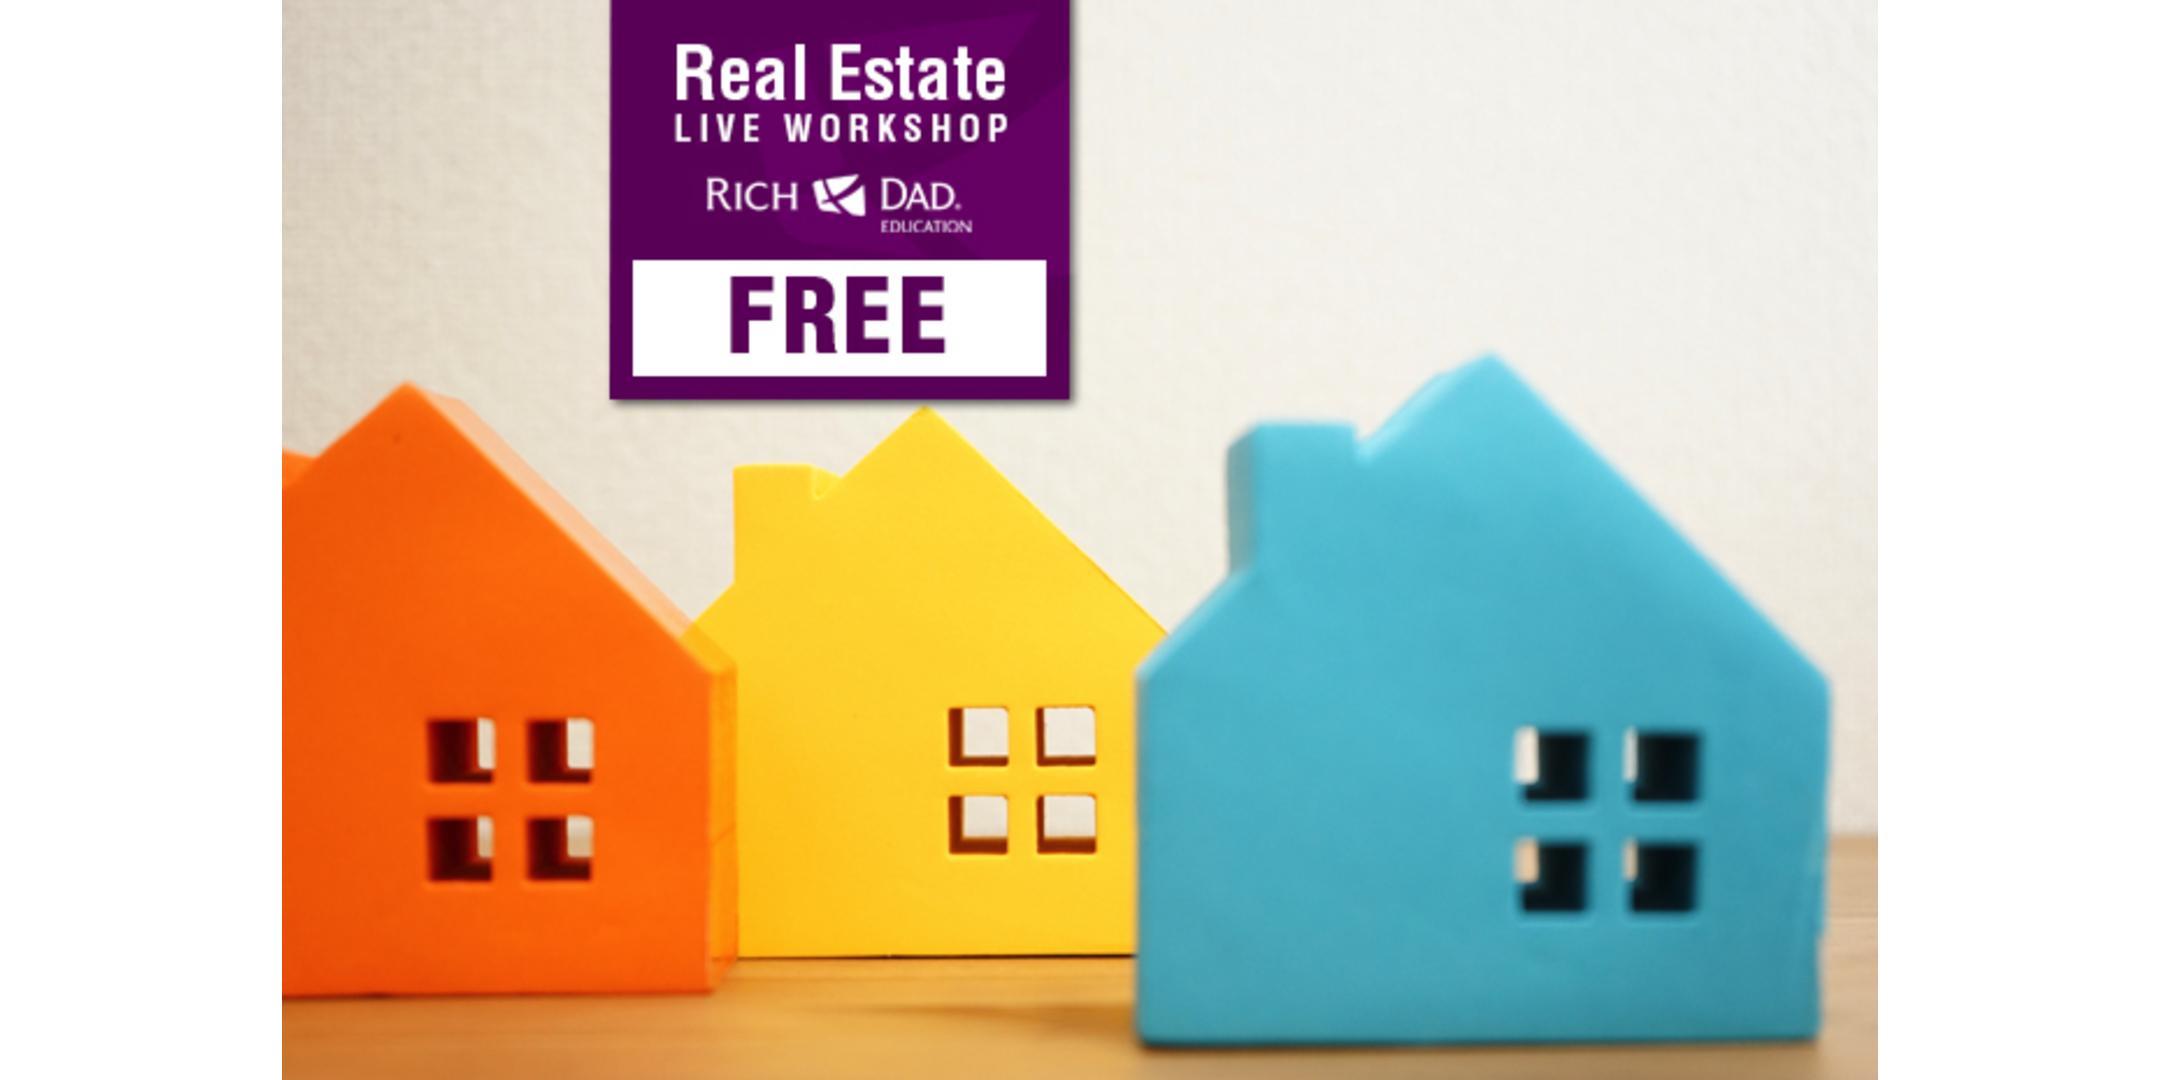 Free Rich Dad Education Real Estate Workshops